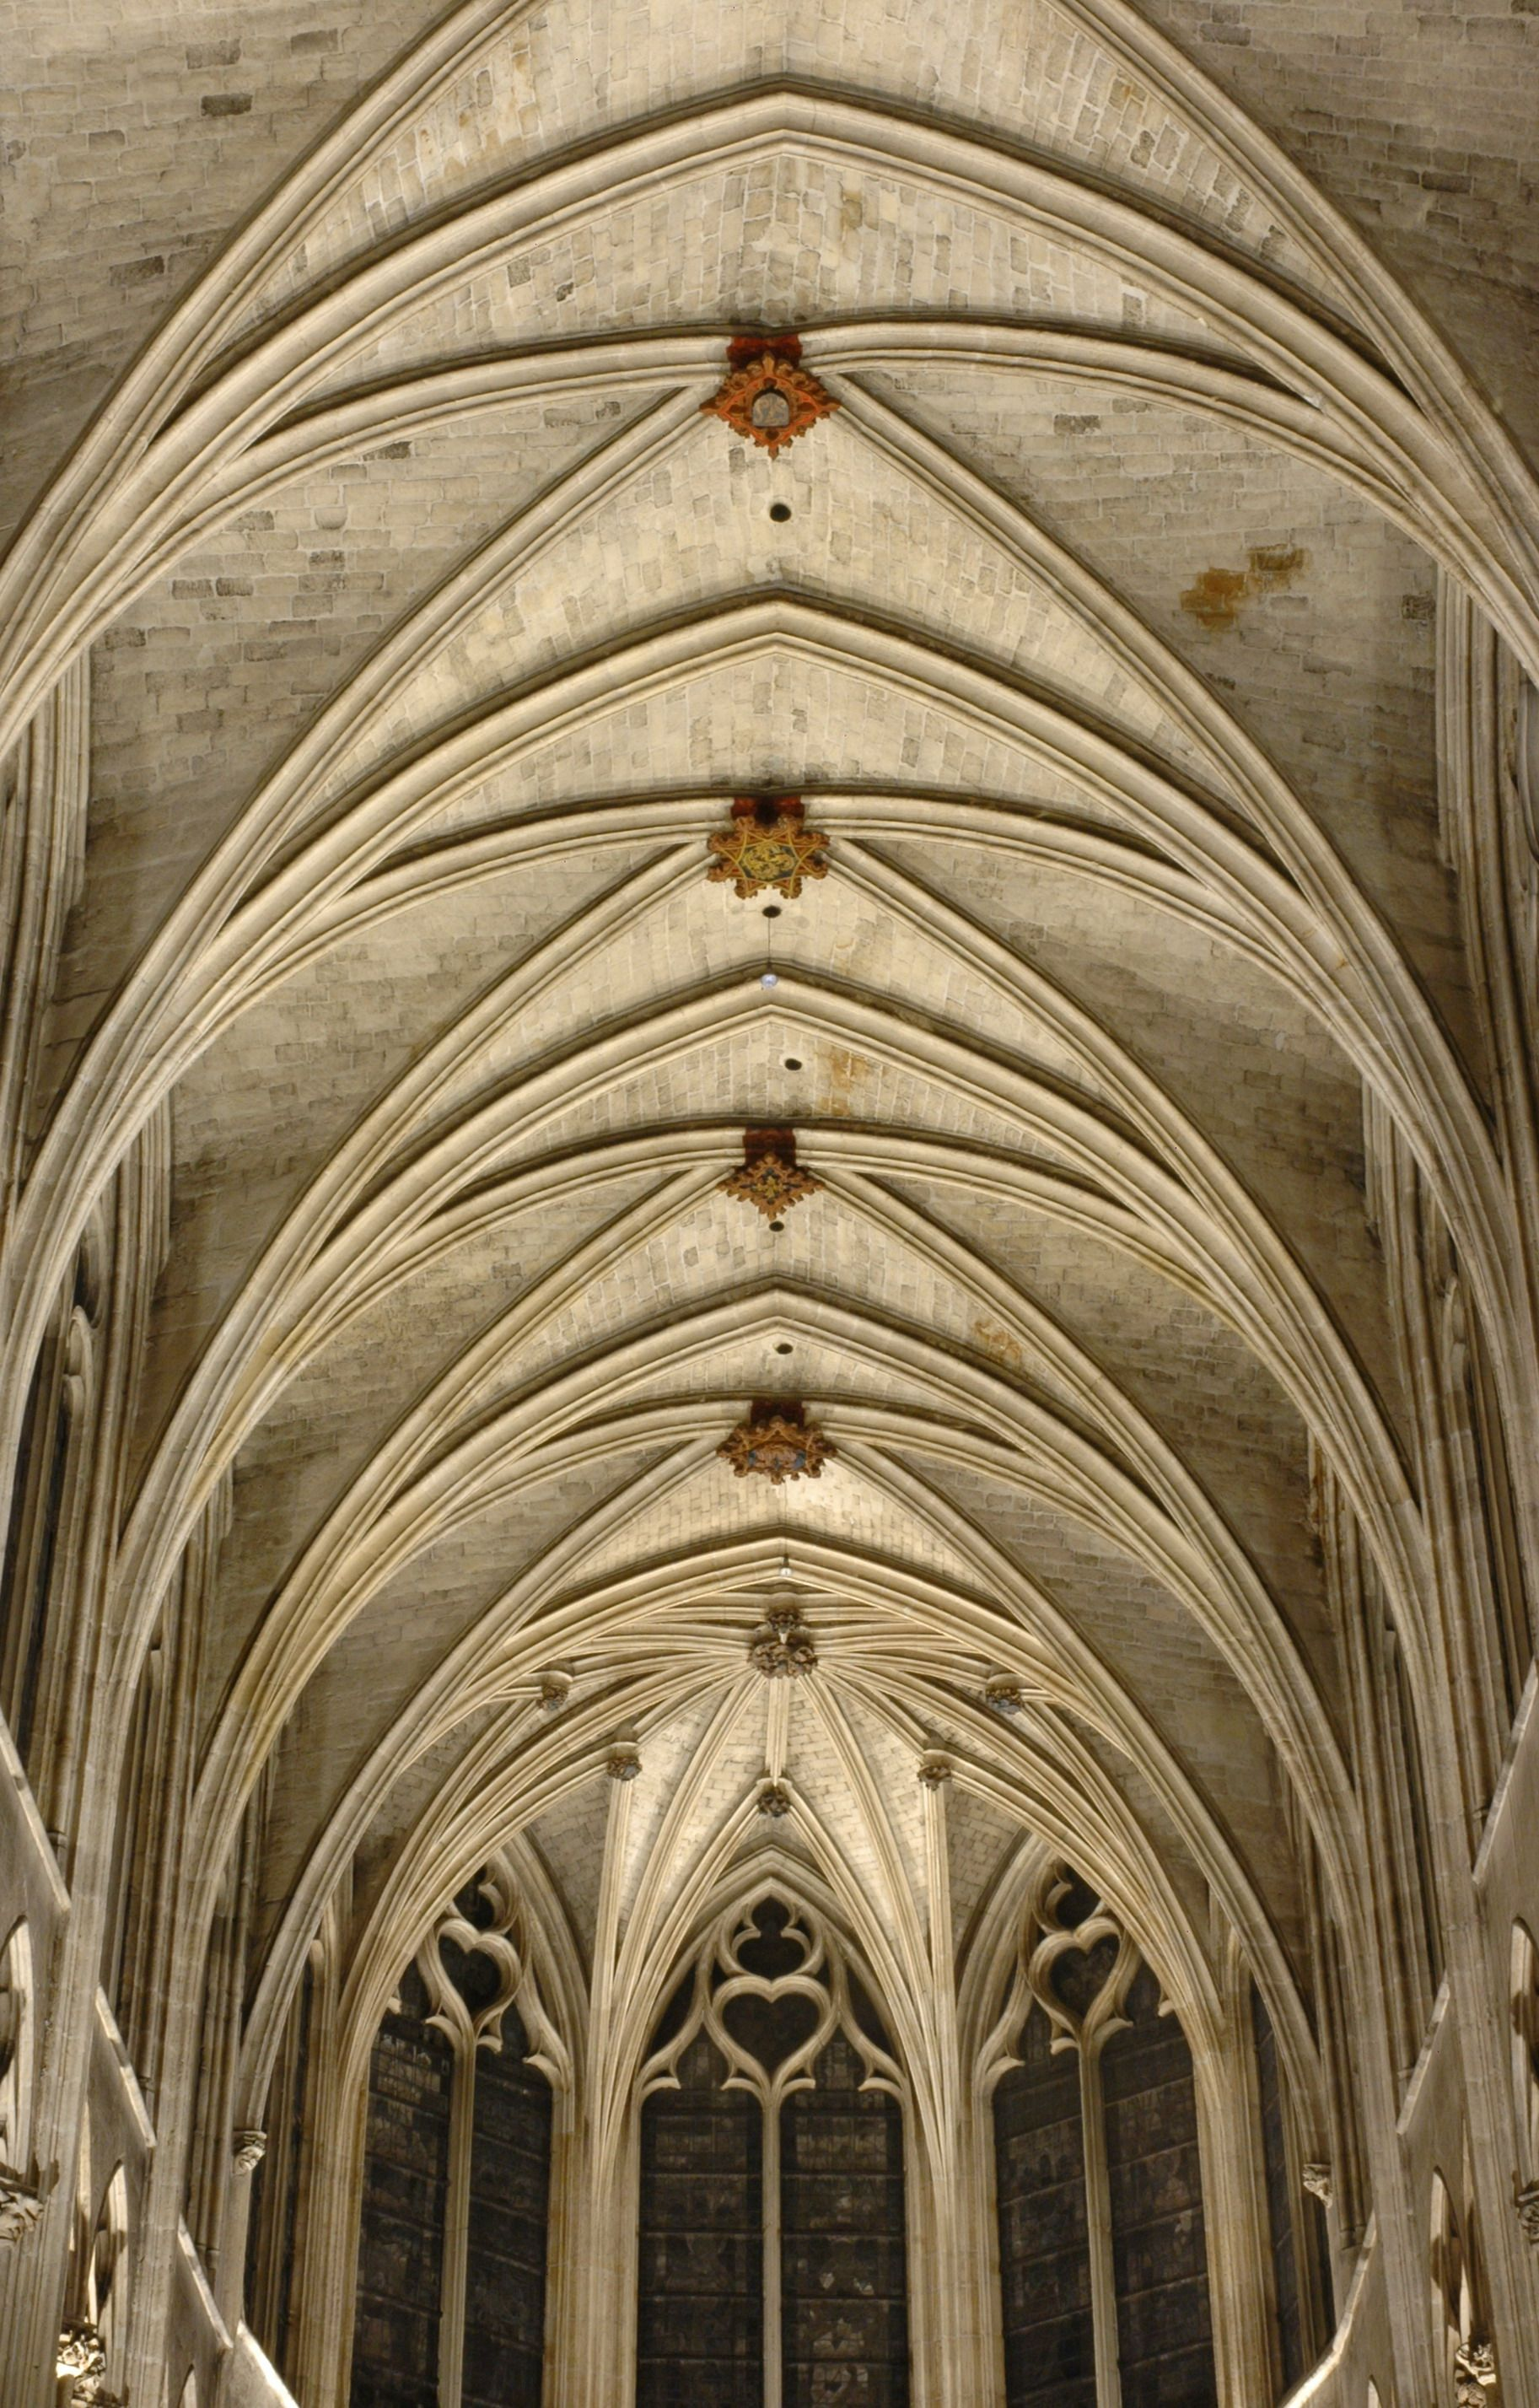 Gothic rib-vault ceiling of the Saint-Sverin church in ...